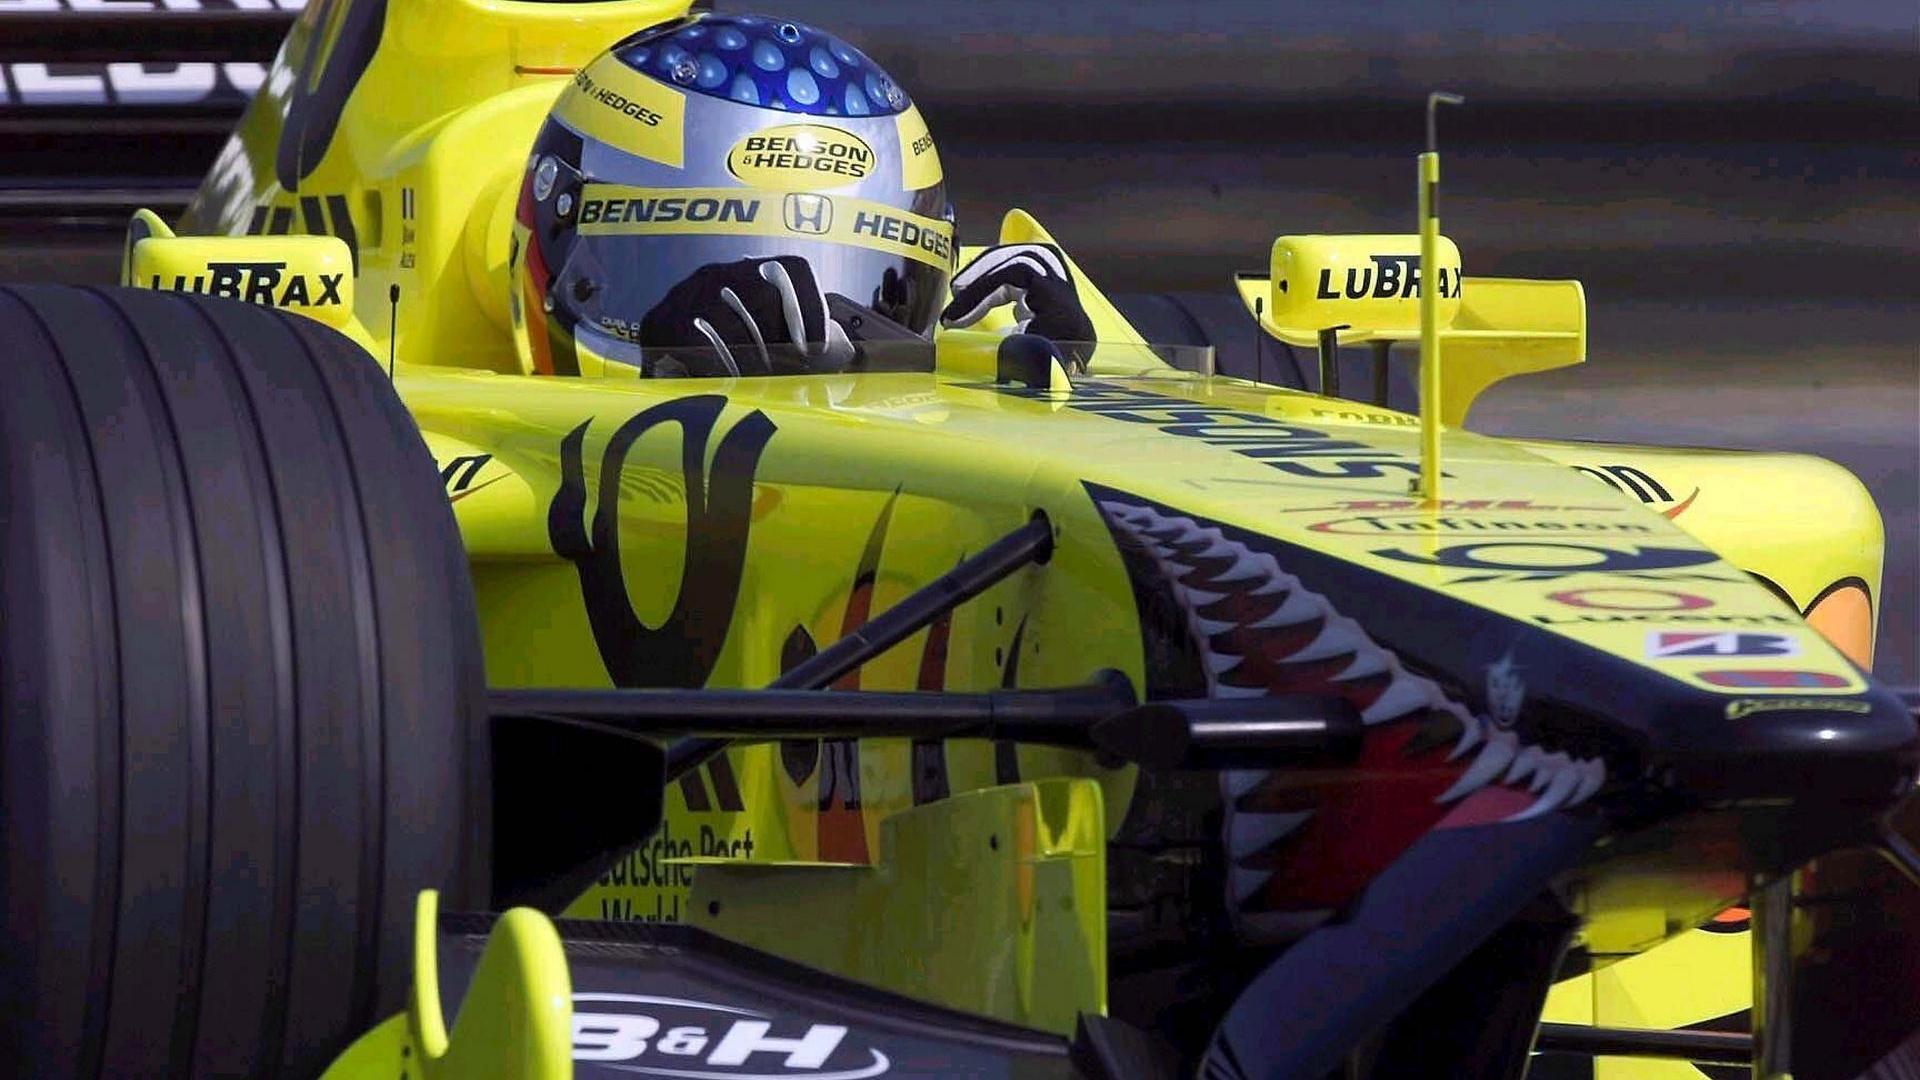 HD Wallpapers 2001 Formula 1 Grand Prix Of Hungary F1